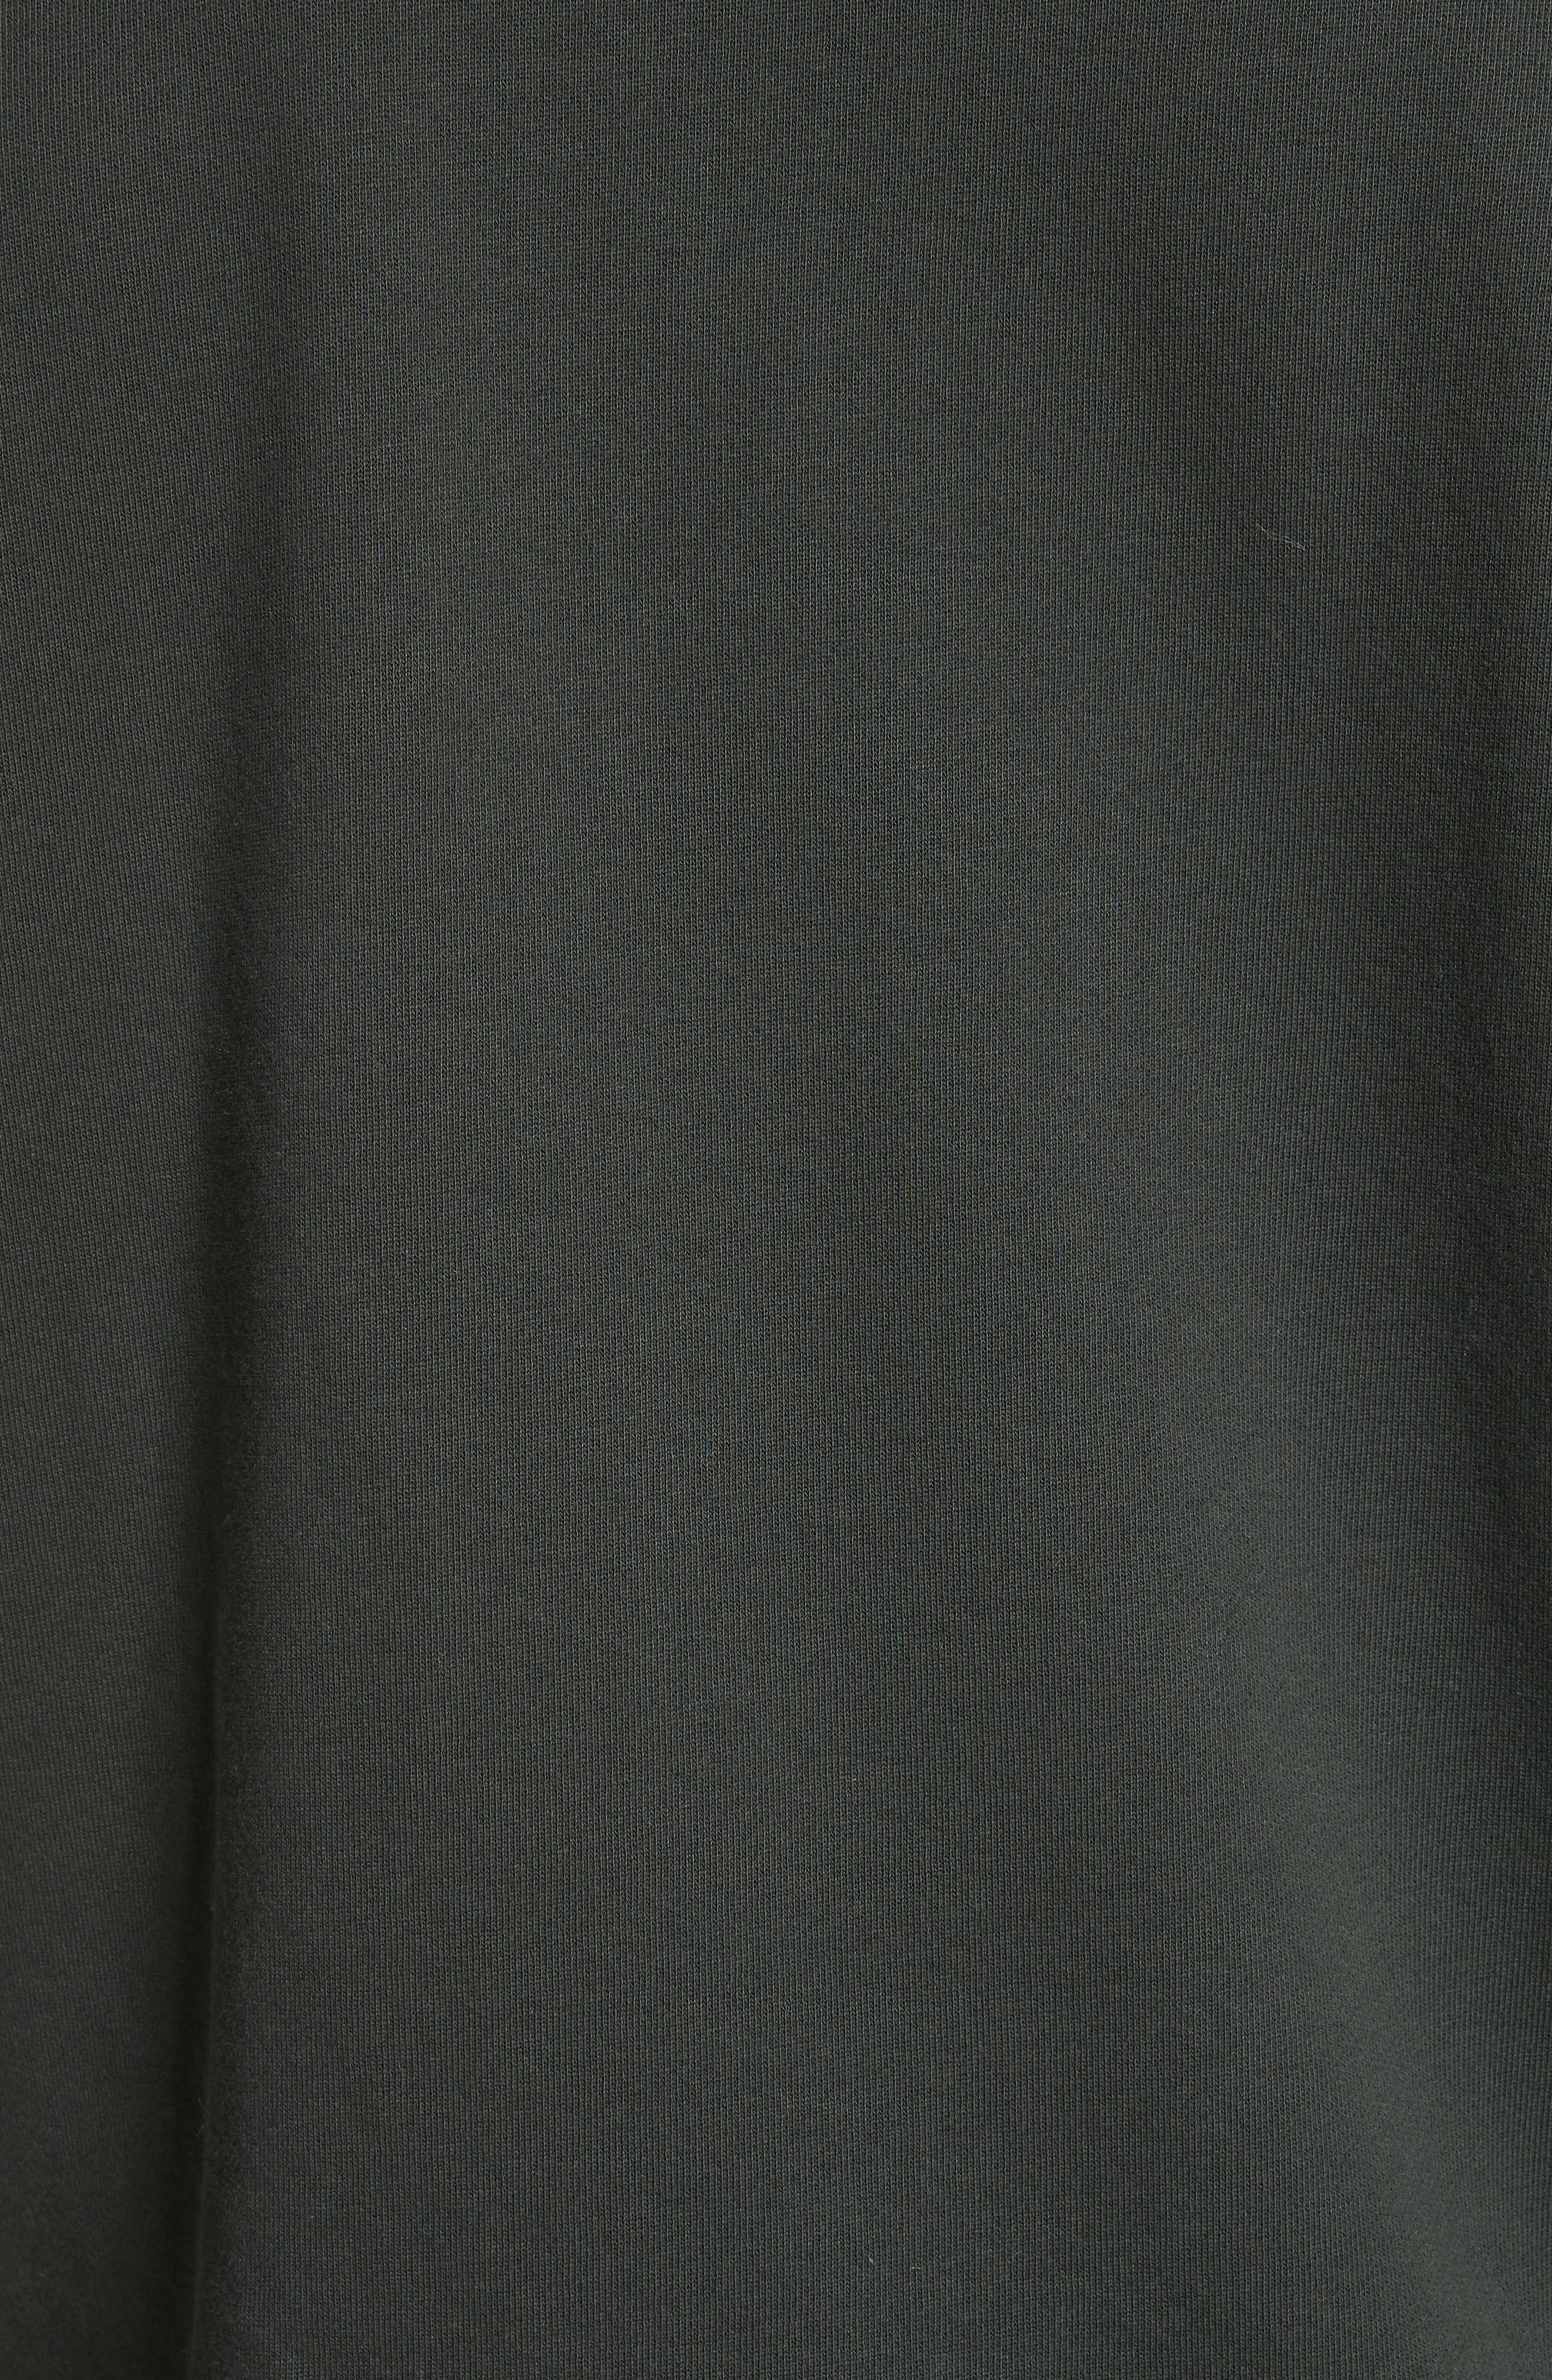 Crewneck Sweatshirt,                             Alternate thumbnail 5, color,                             Jungle Green